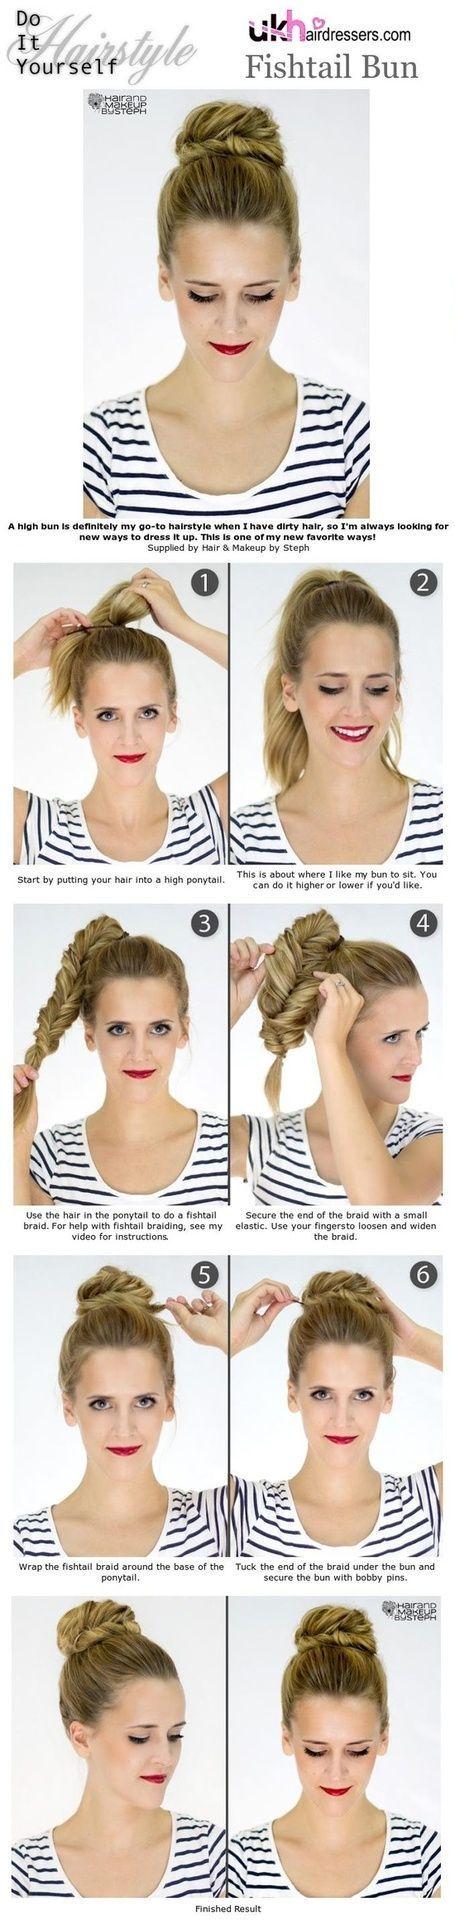 Diy hairstyles hair pinterest beauty ideas fishtail bun and diy hairstyles solutioingenieria Gallery